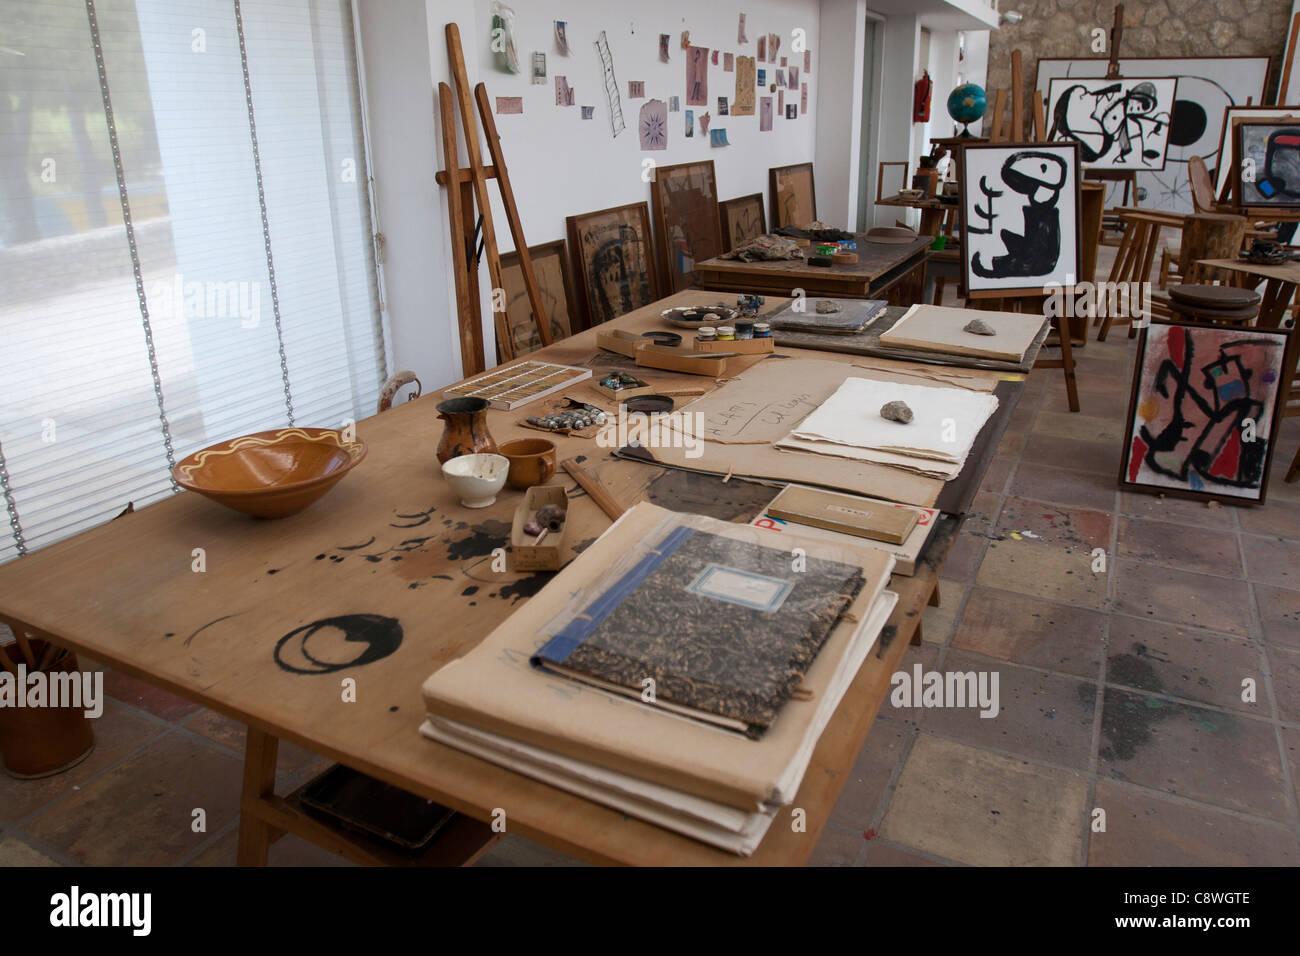 mallorca mallorca balearen spanien miro stiftung museum innen atelier k nstler atelier malen. Black Bedroom Furniture Sets. Home Design Ideas